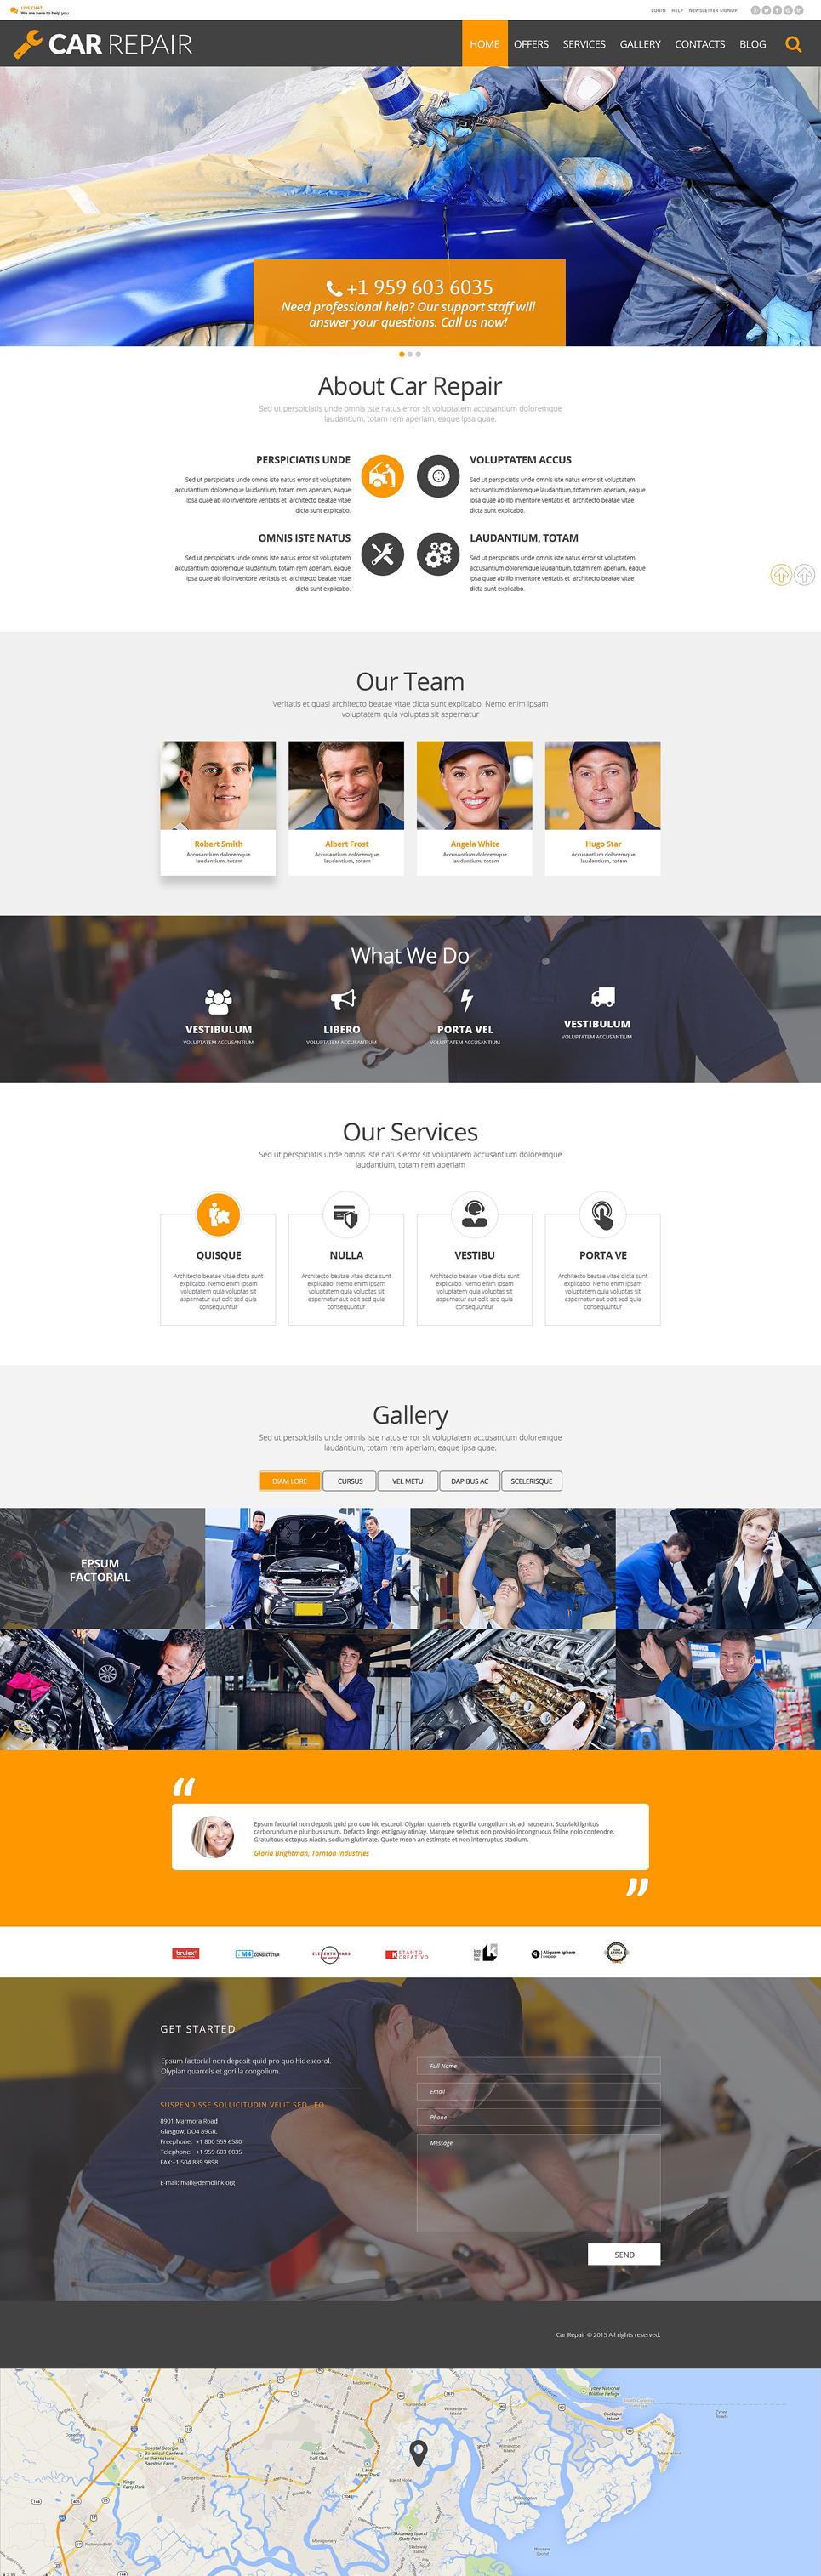 Адаптивный шаблон сайта на тему ремонт авто #54989